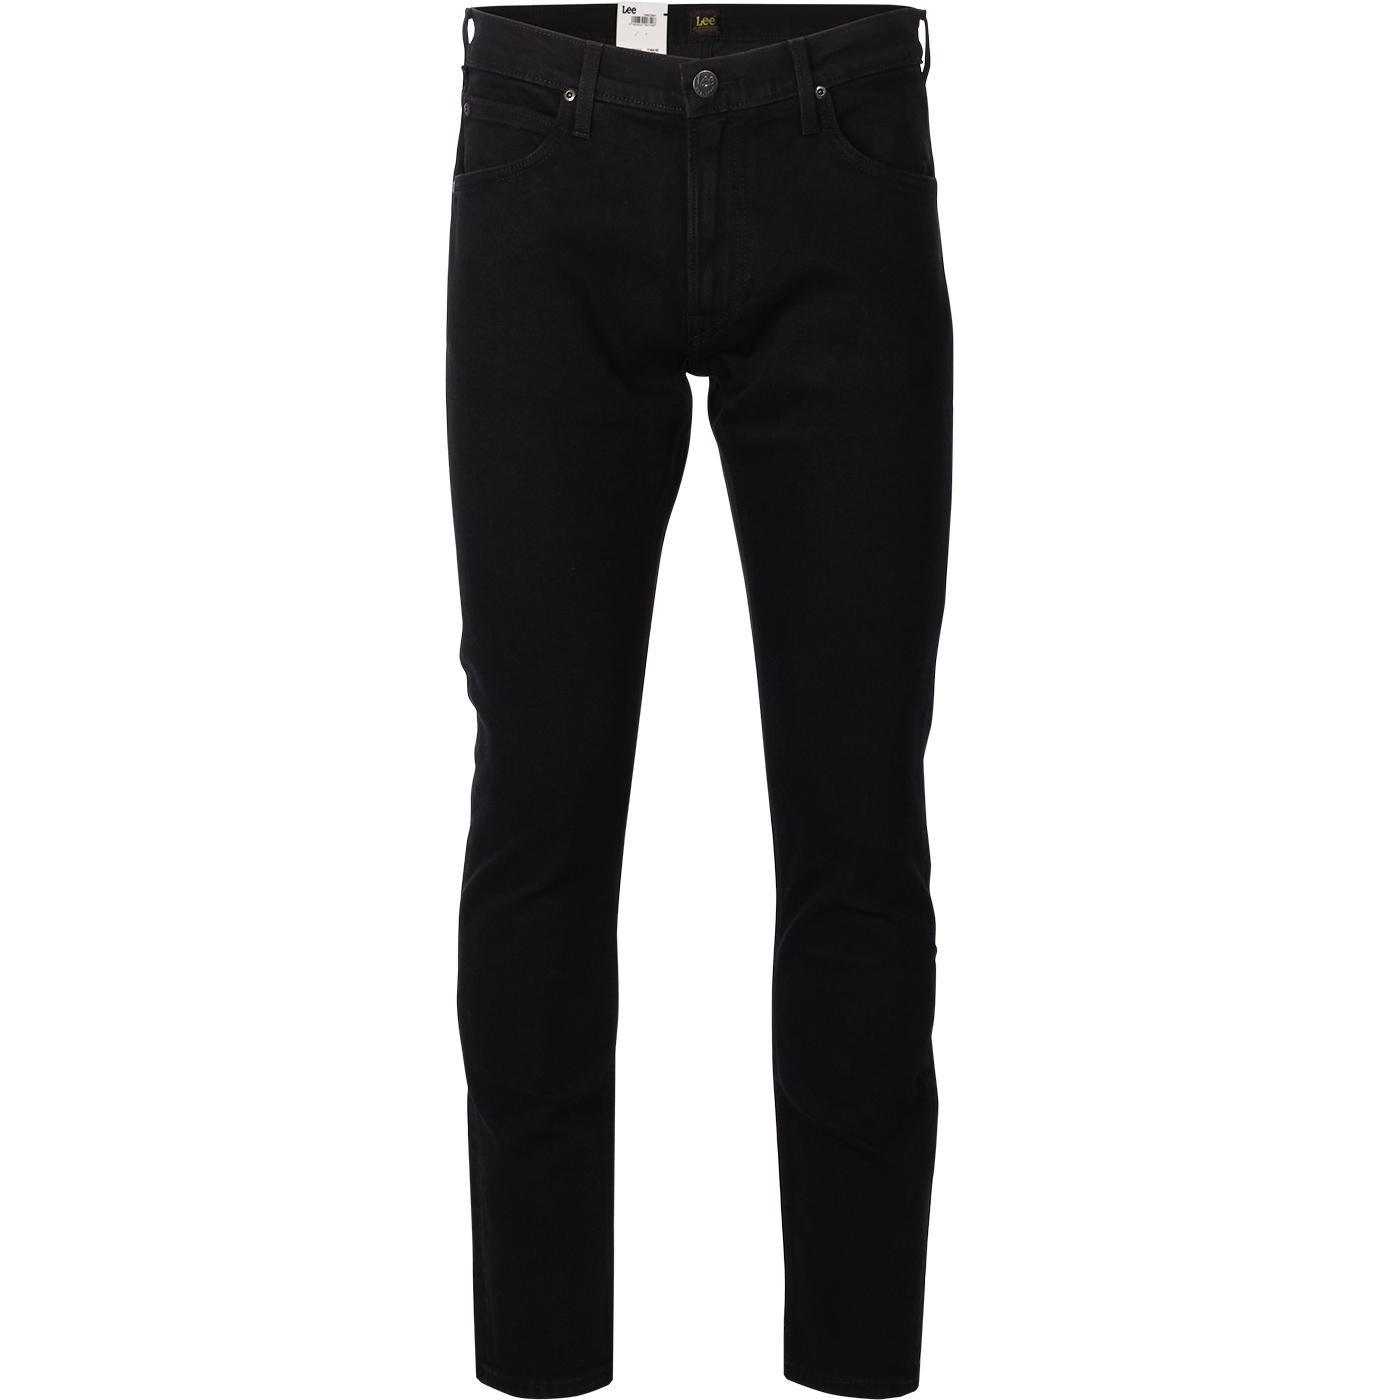 Luke LEE JEANS Mod Slim Tapered Denim Jeans B/B